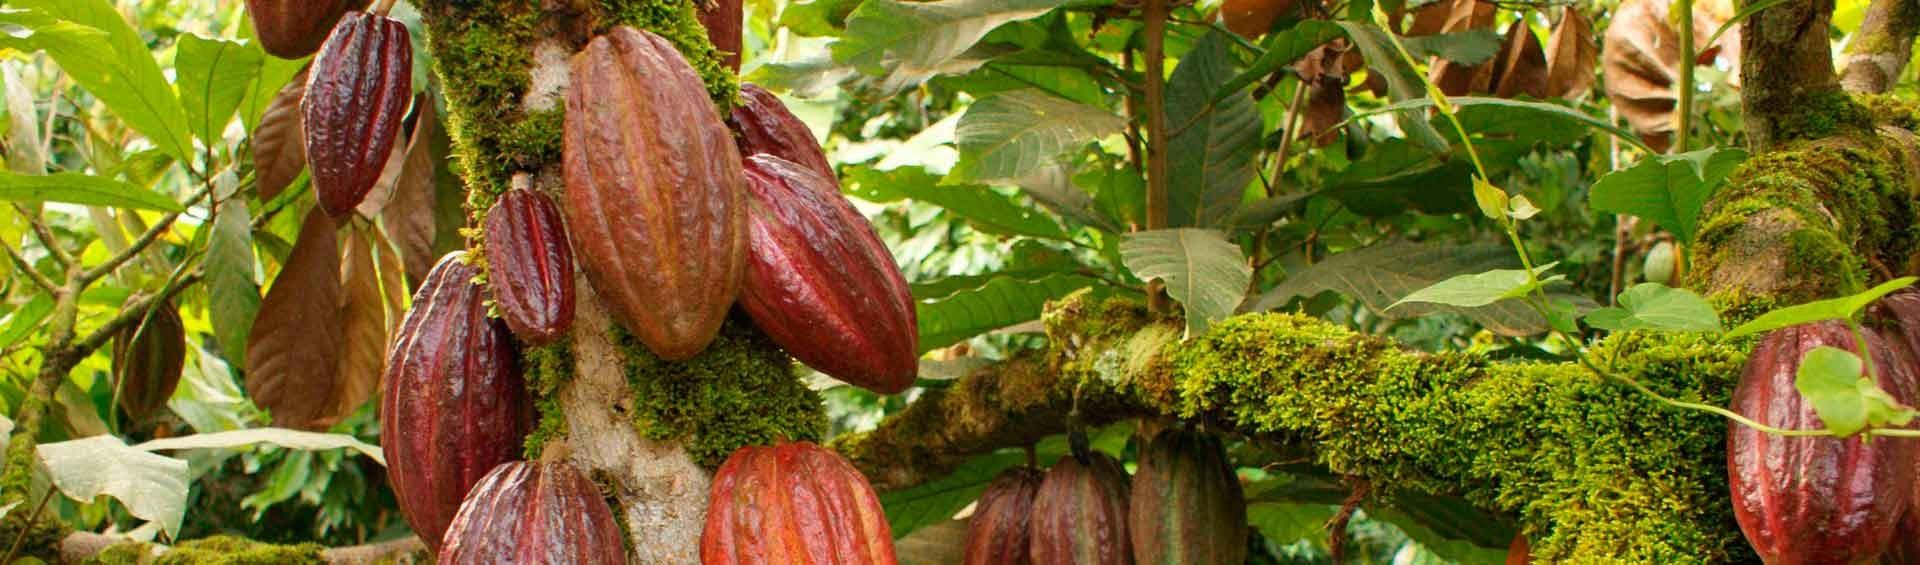 Chocolate procedente de cacao fino de aroma, con mas conciencia social